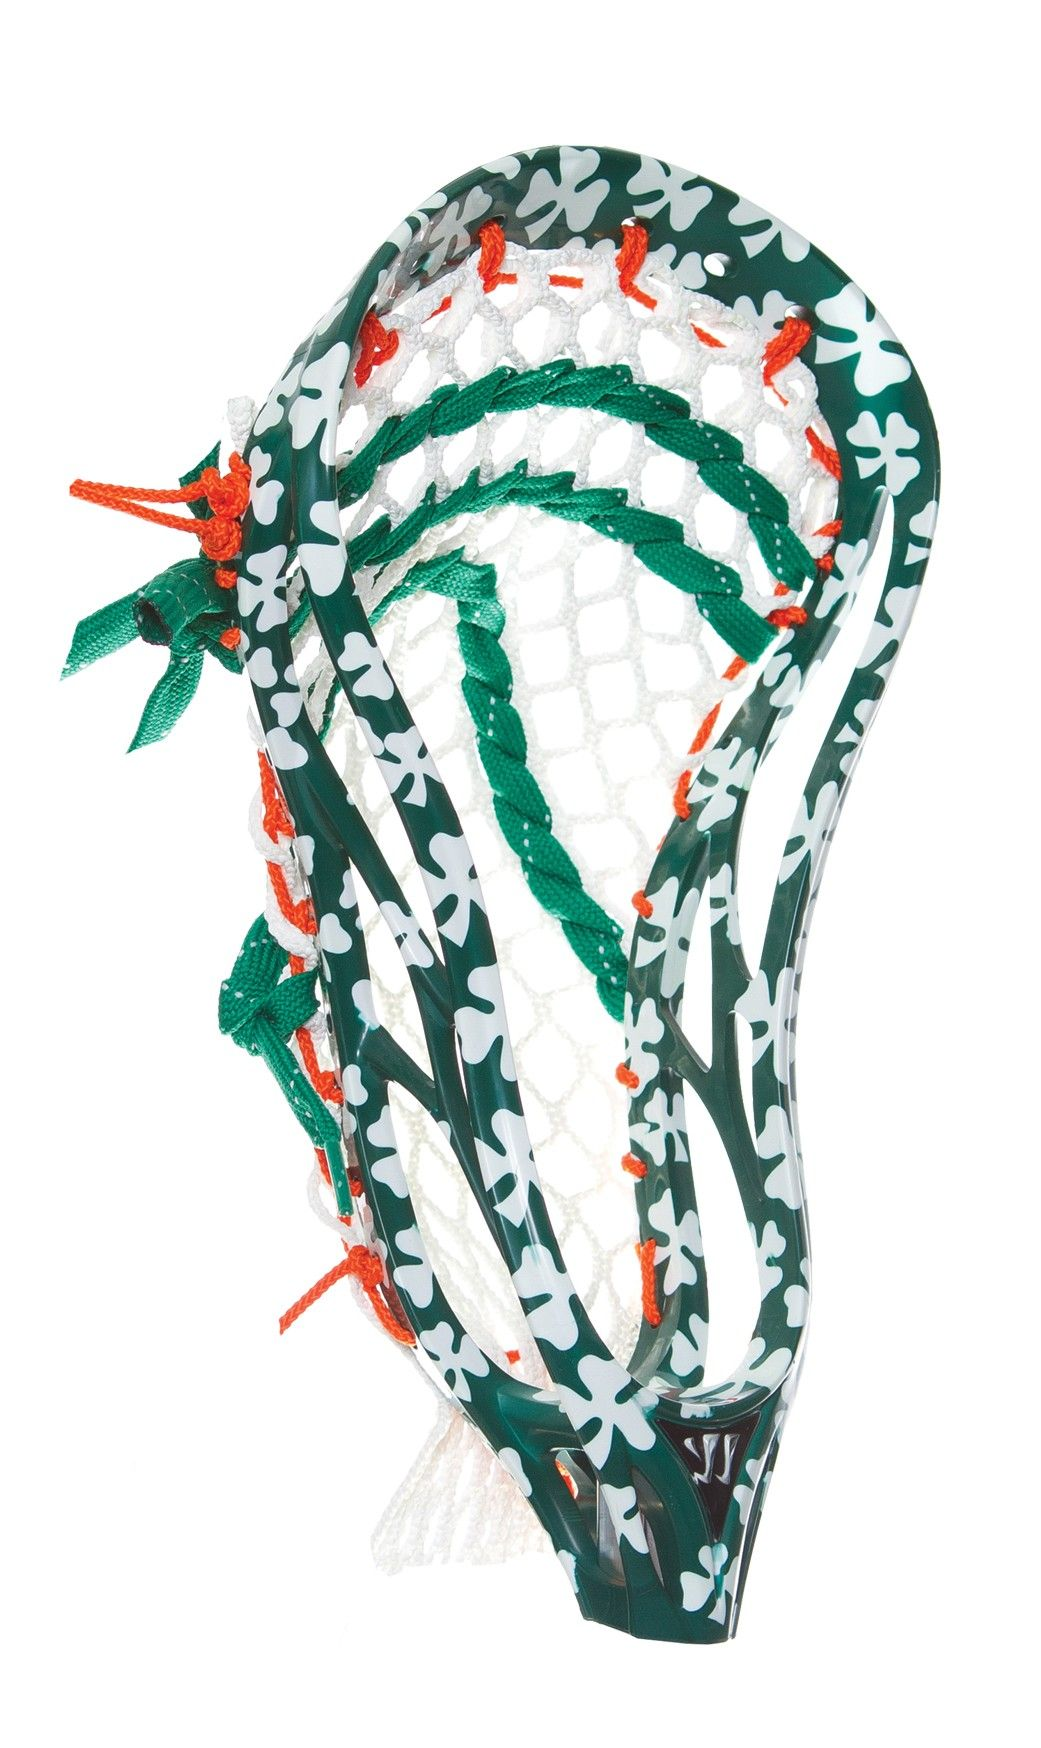 Lacrosse Unlimited Exclusive Custom Ultra Shamrocks Dye Available On Most Lacrosse Heads Lacrosse Sticks Mens Lacrosse Lacrosse